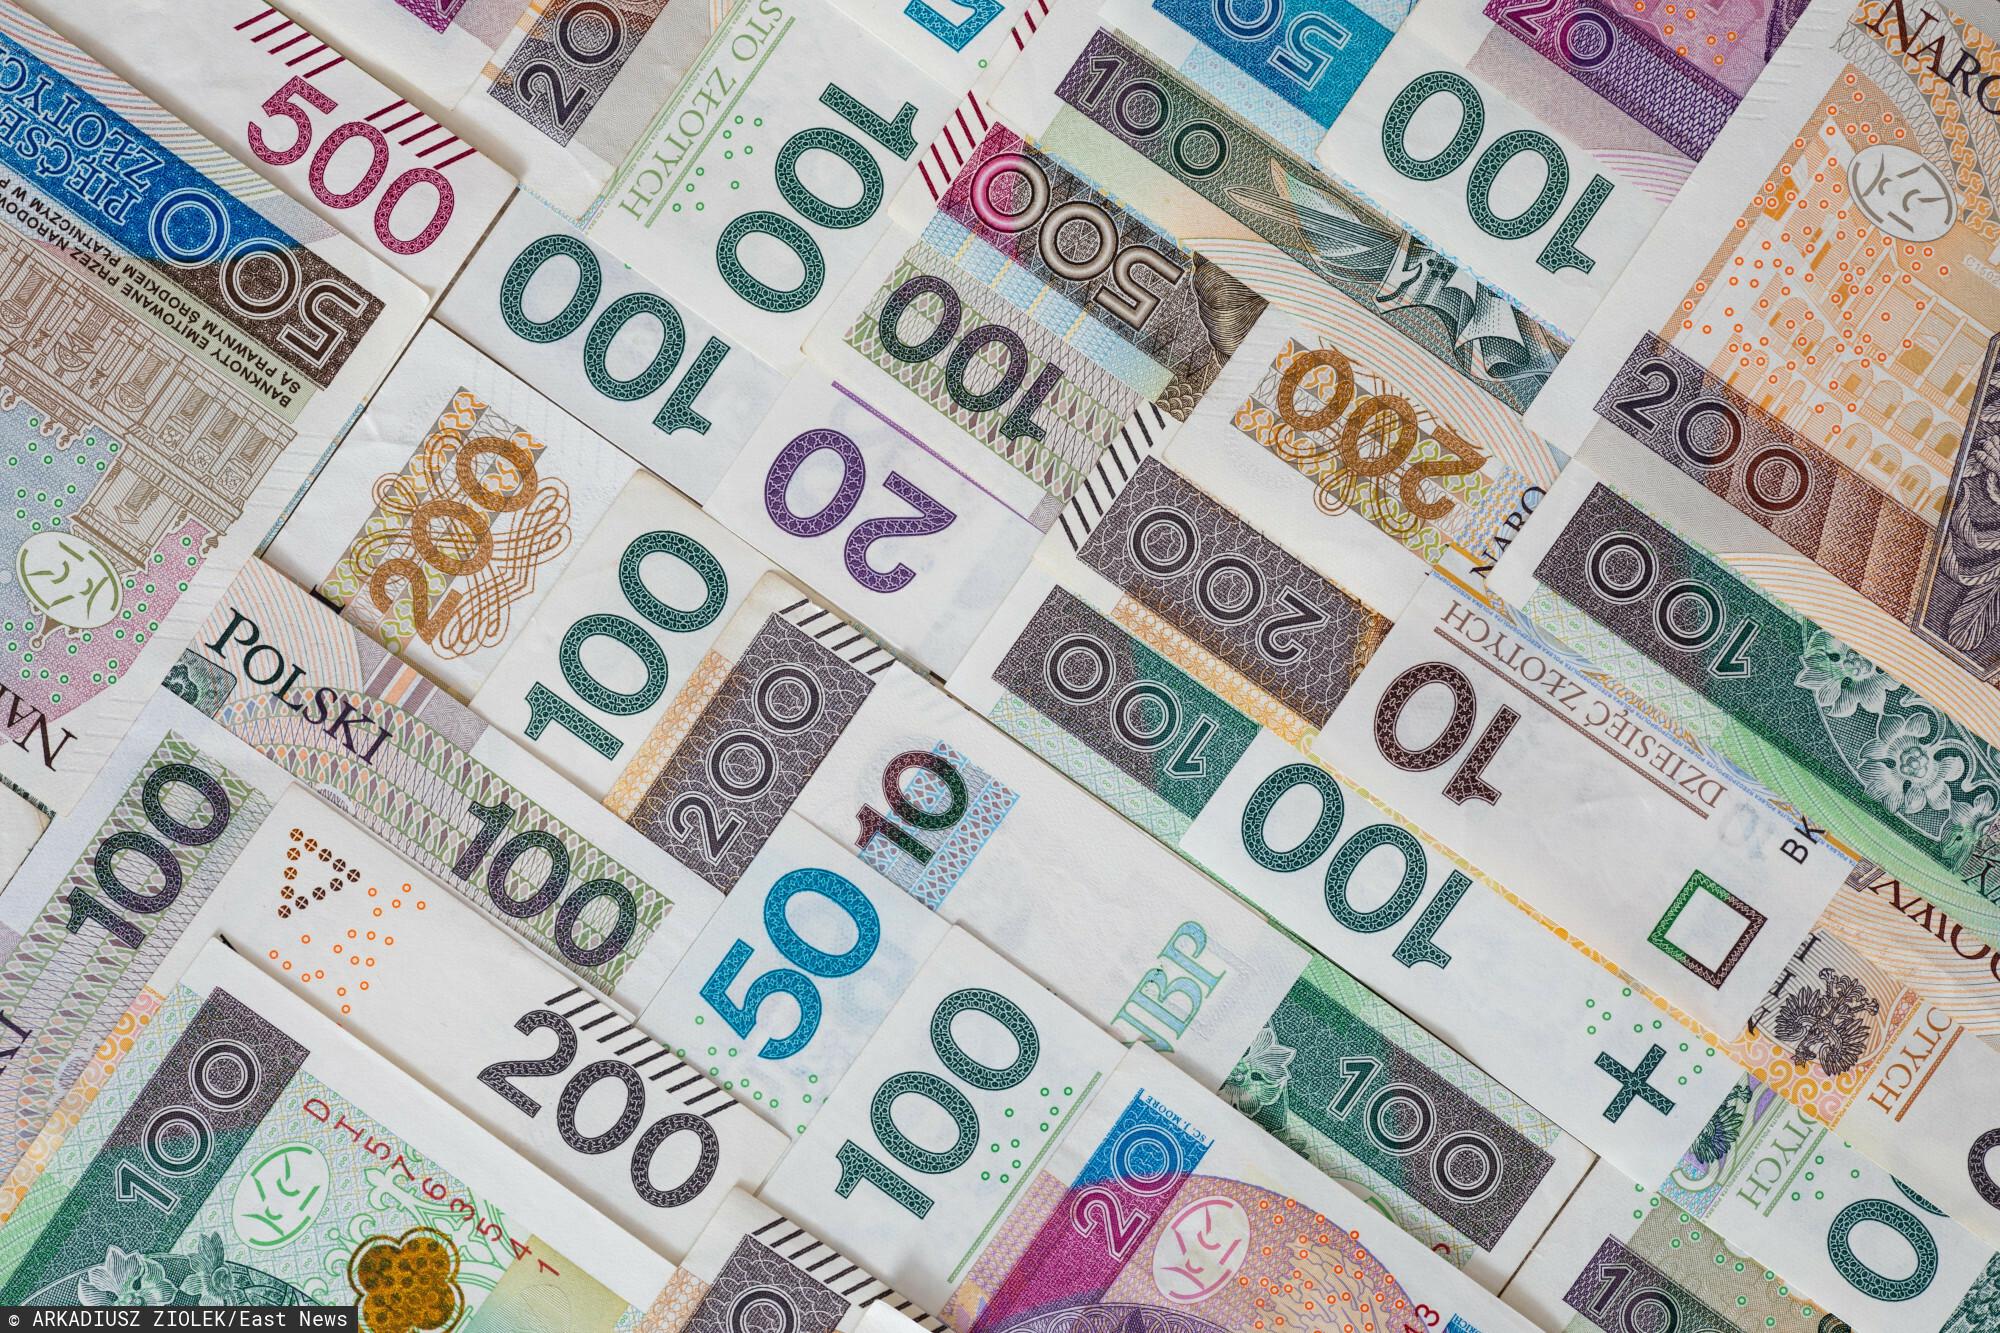 fot: Arkadiusz Ziolek/ East News. n/z Polskie banknoty.